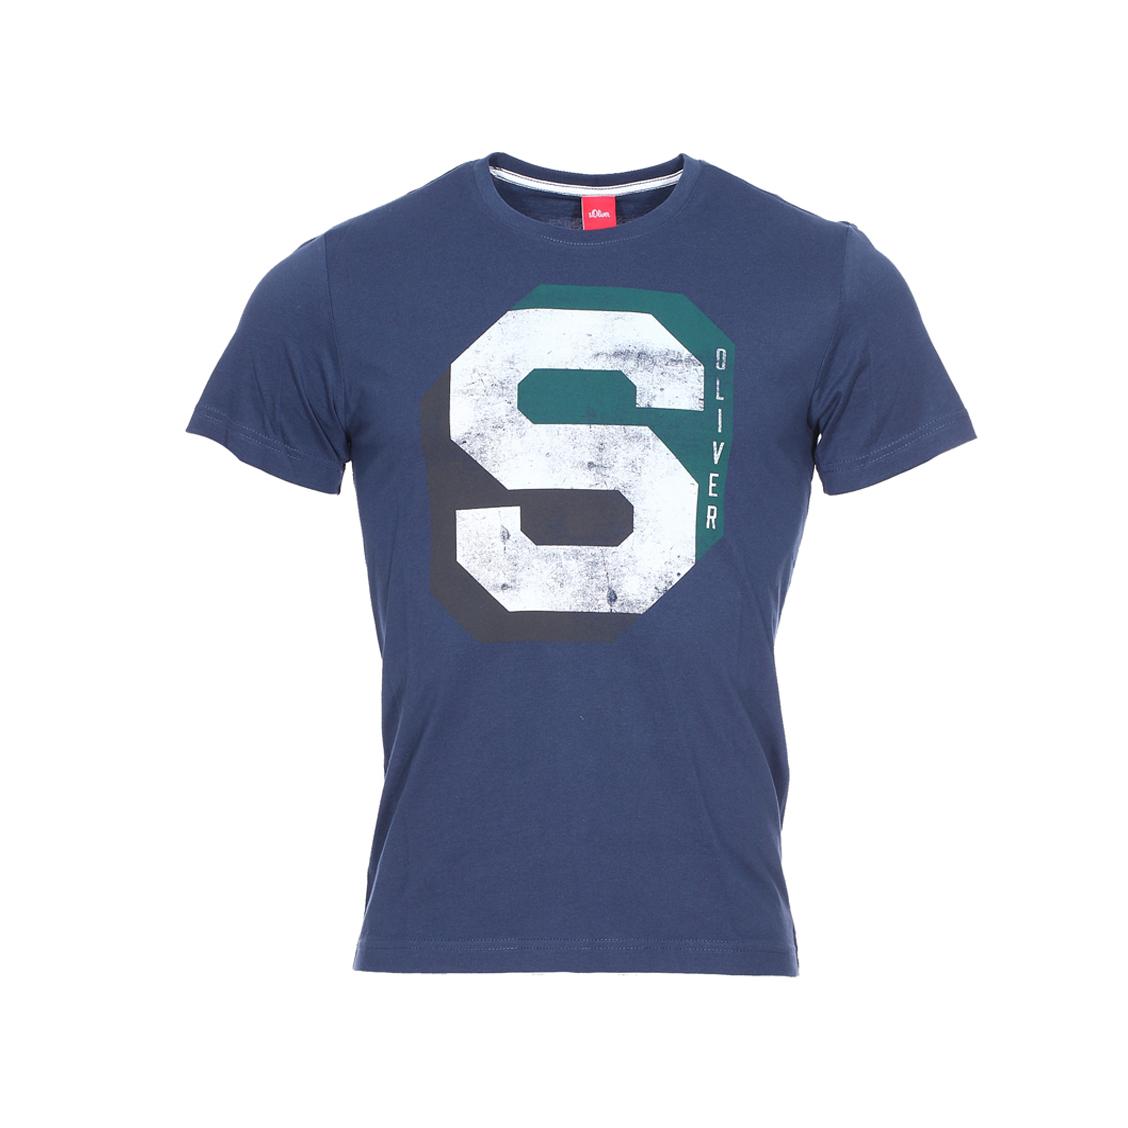 Tee-shirt col rond s.oliver bleu marine floqué en blanc, gris et vert